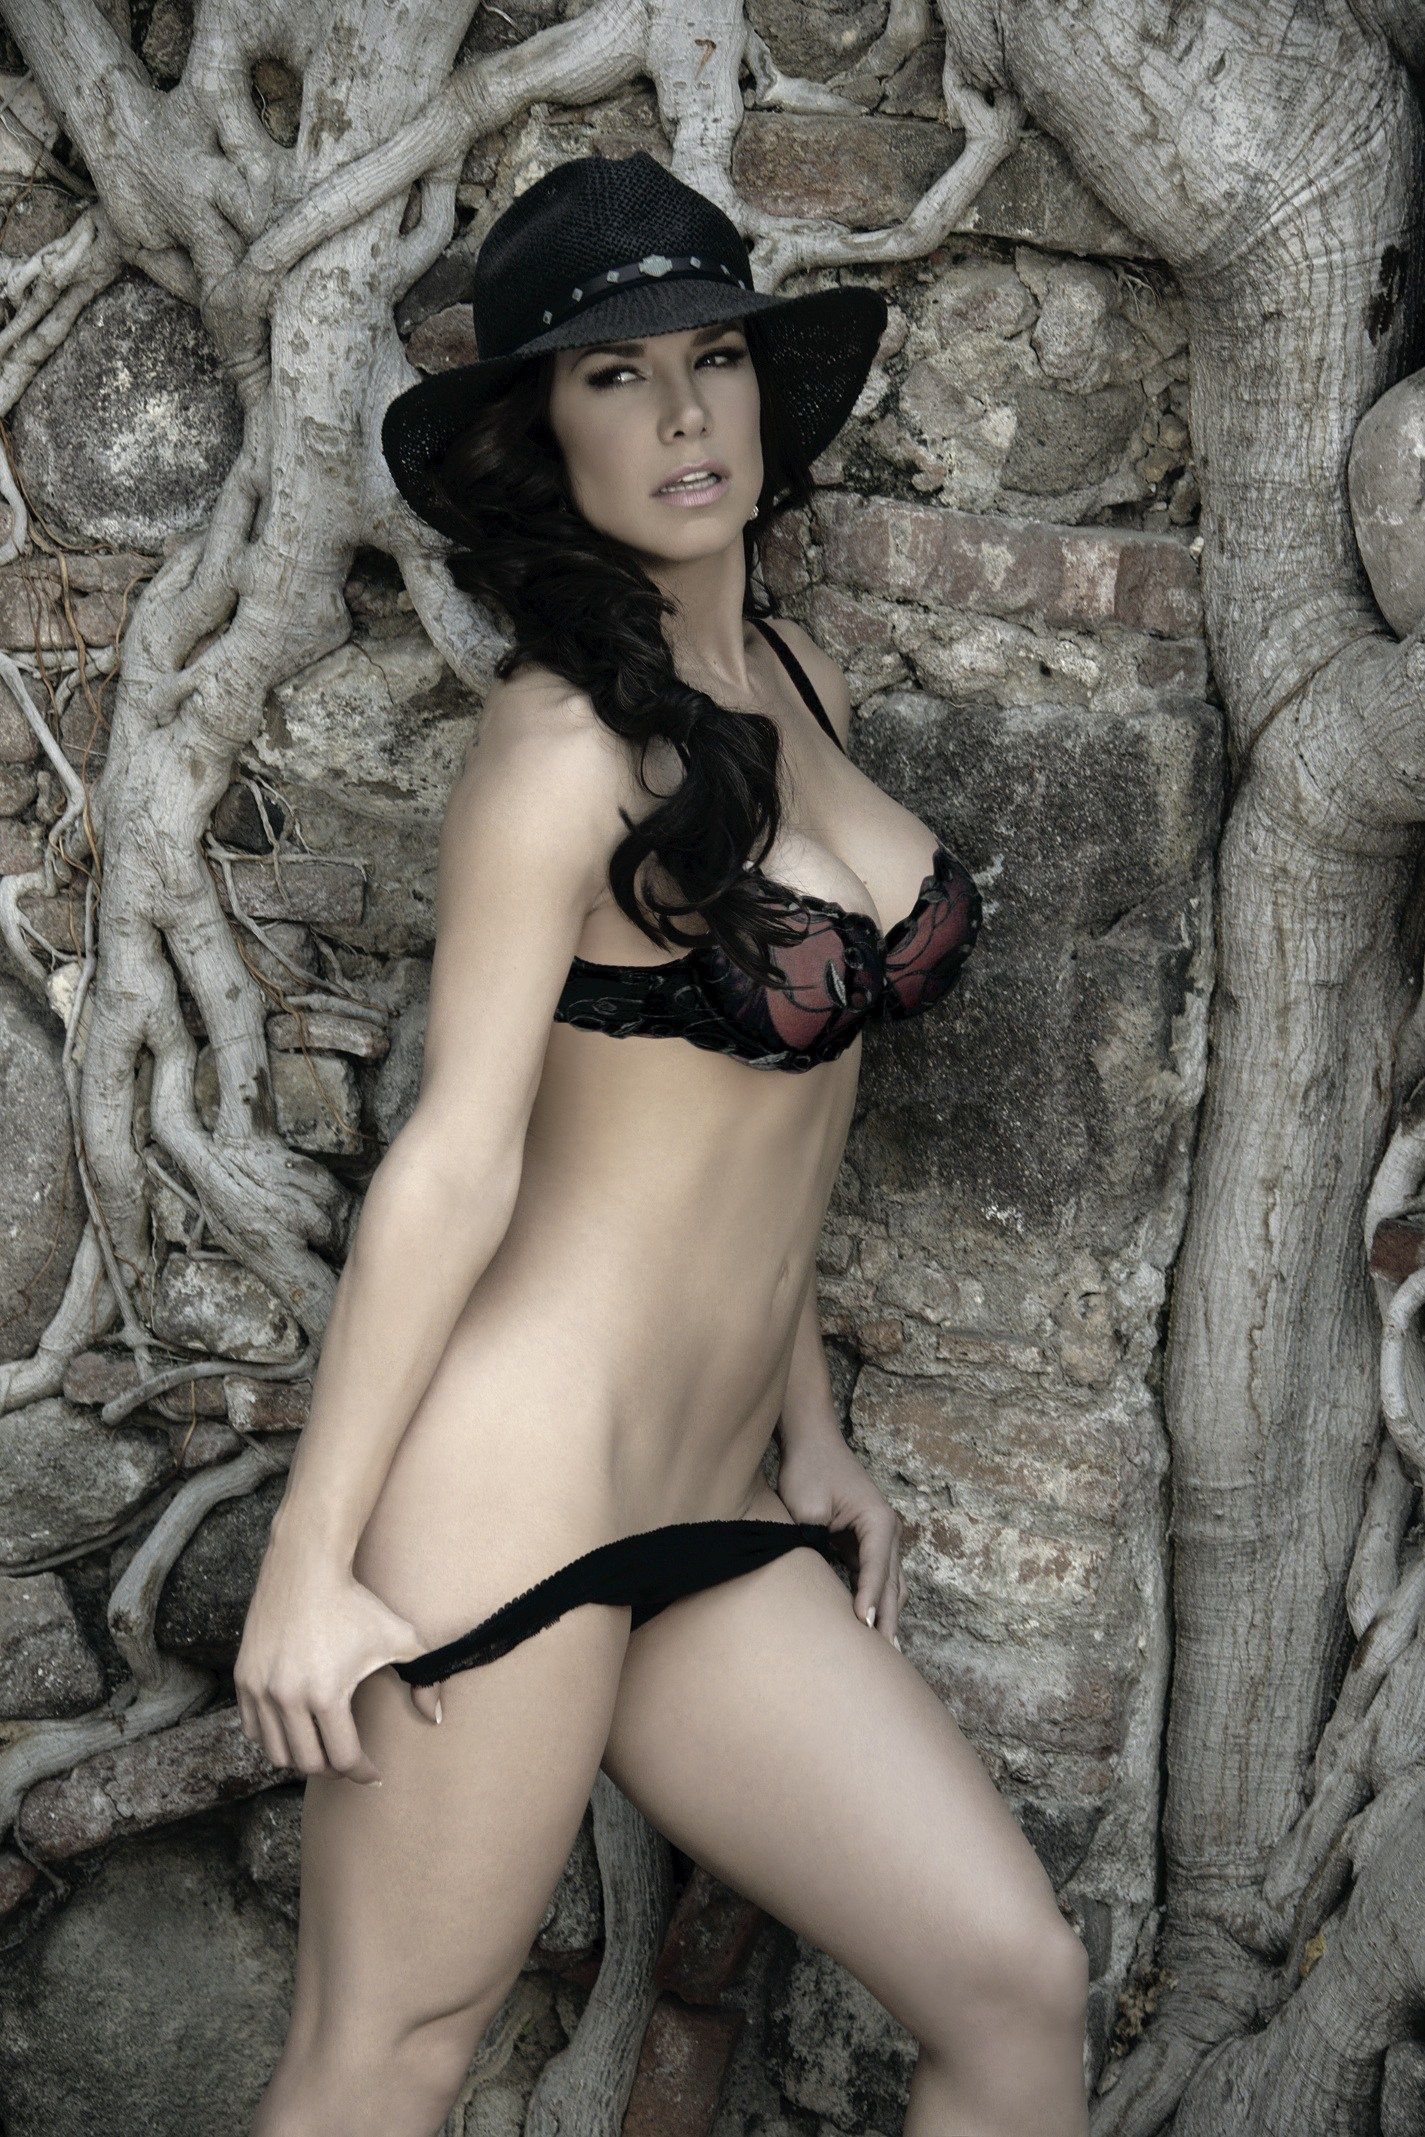 Paparazzi Lis Vega nudes (82 photo), Tits, Fappening, Selfie, underwear 2017